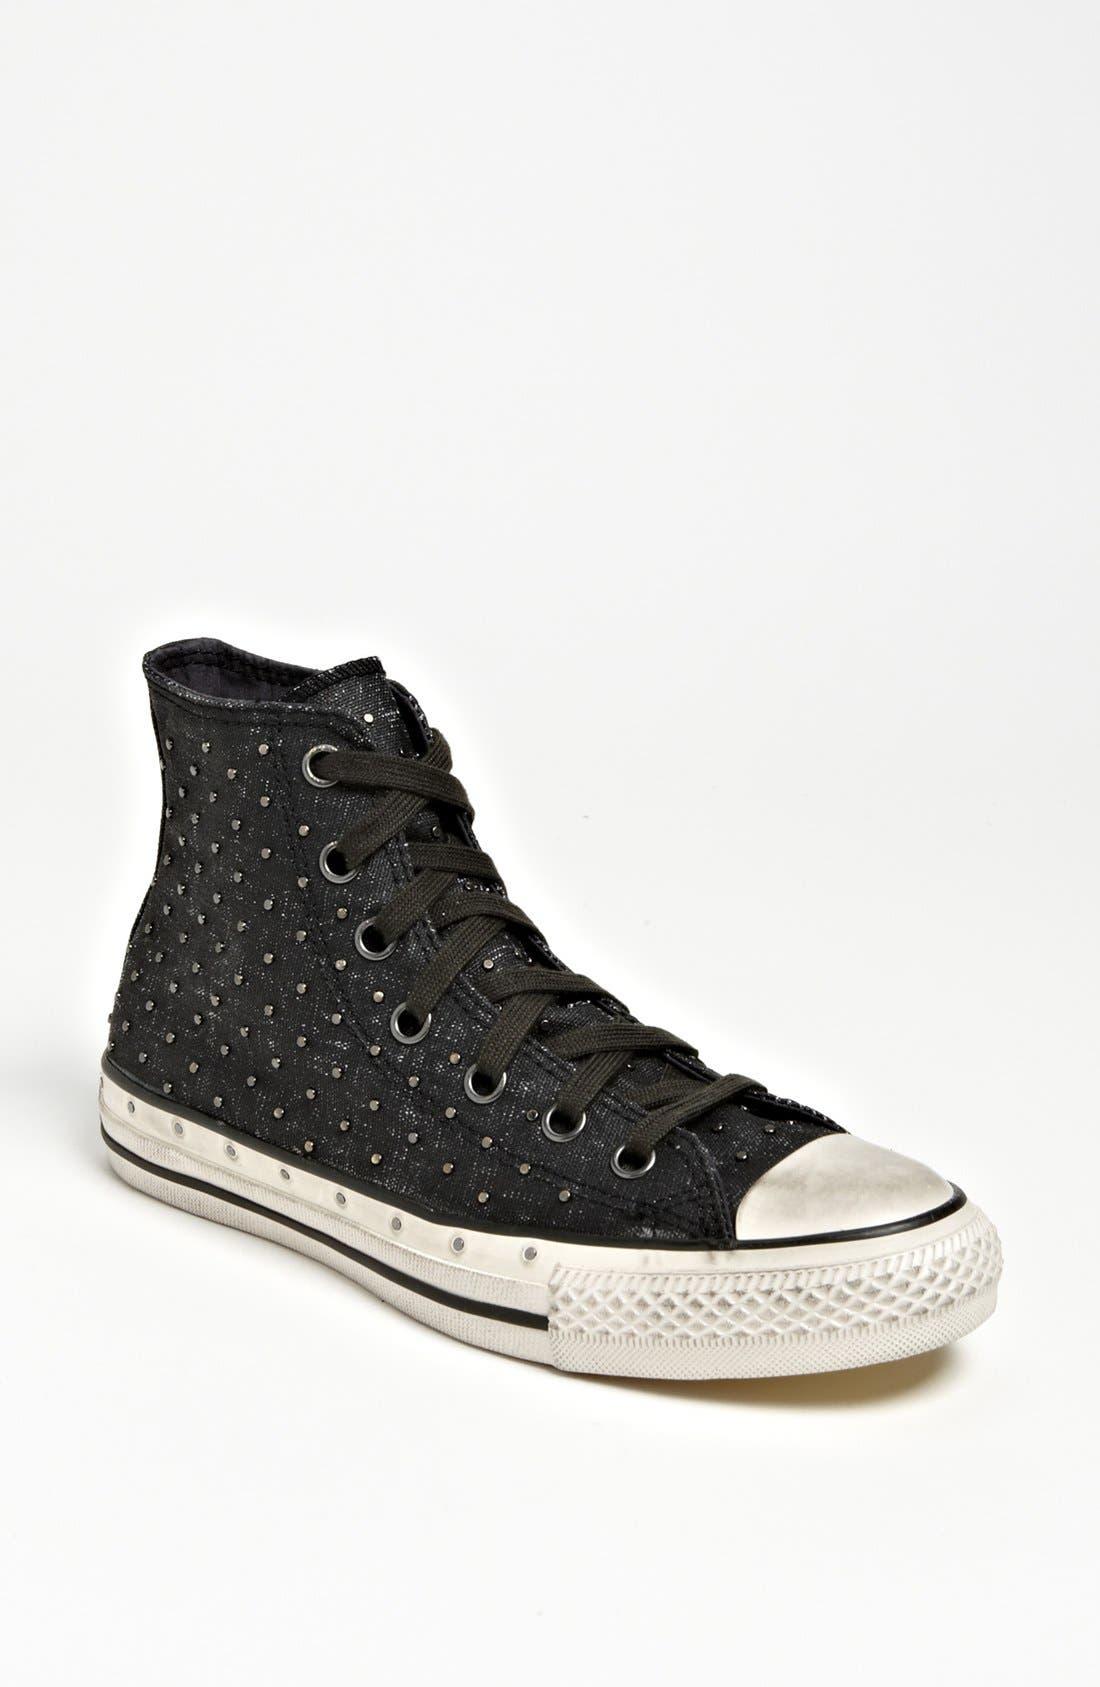 Main Image - Converse by John Varvatos 'All Star® Hi Studded' Sneaker (Women)